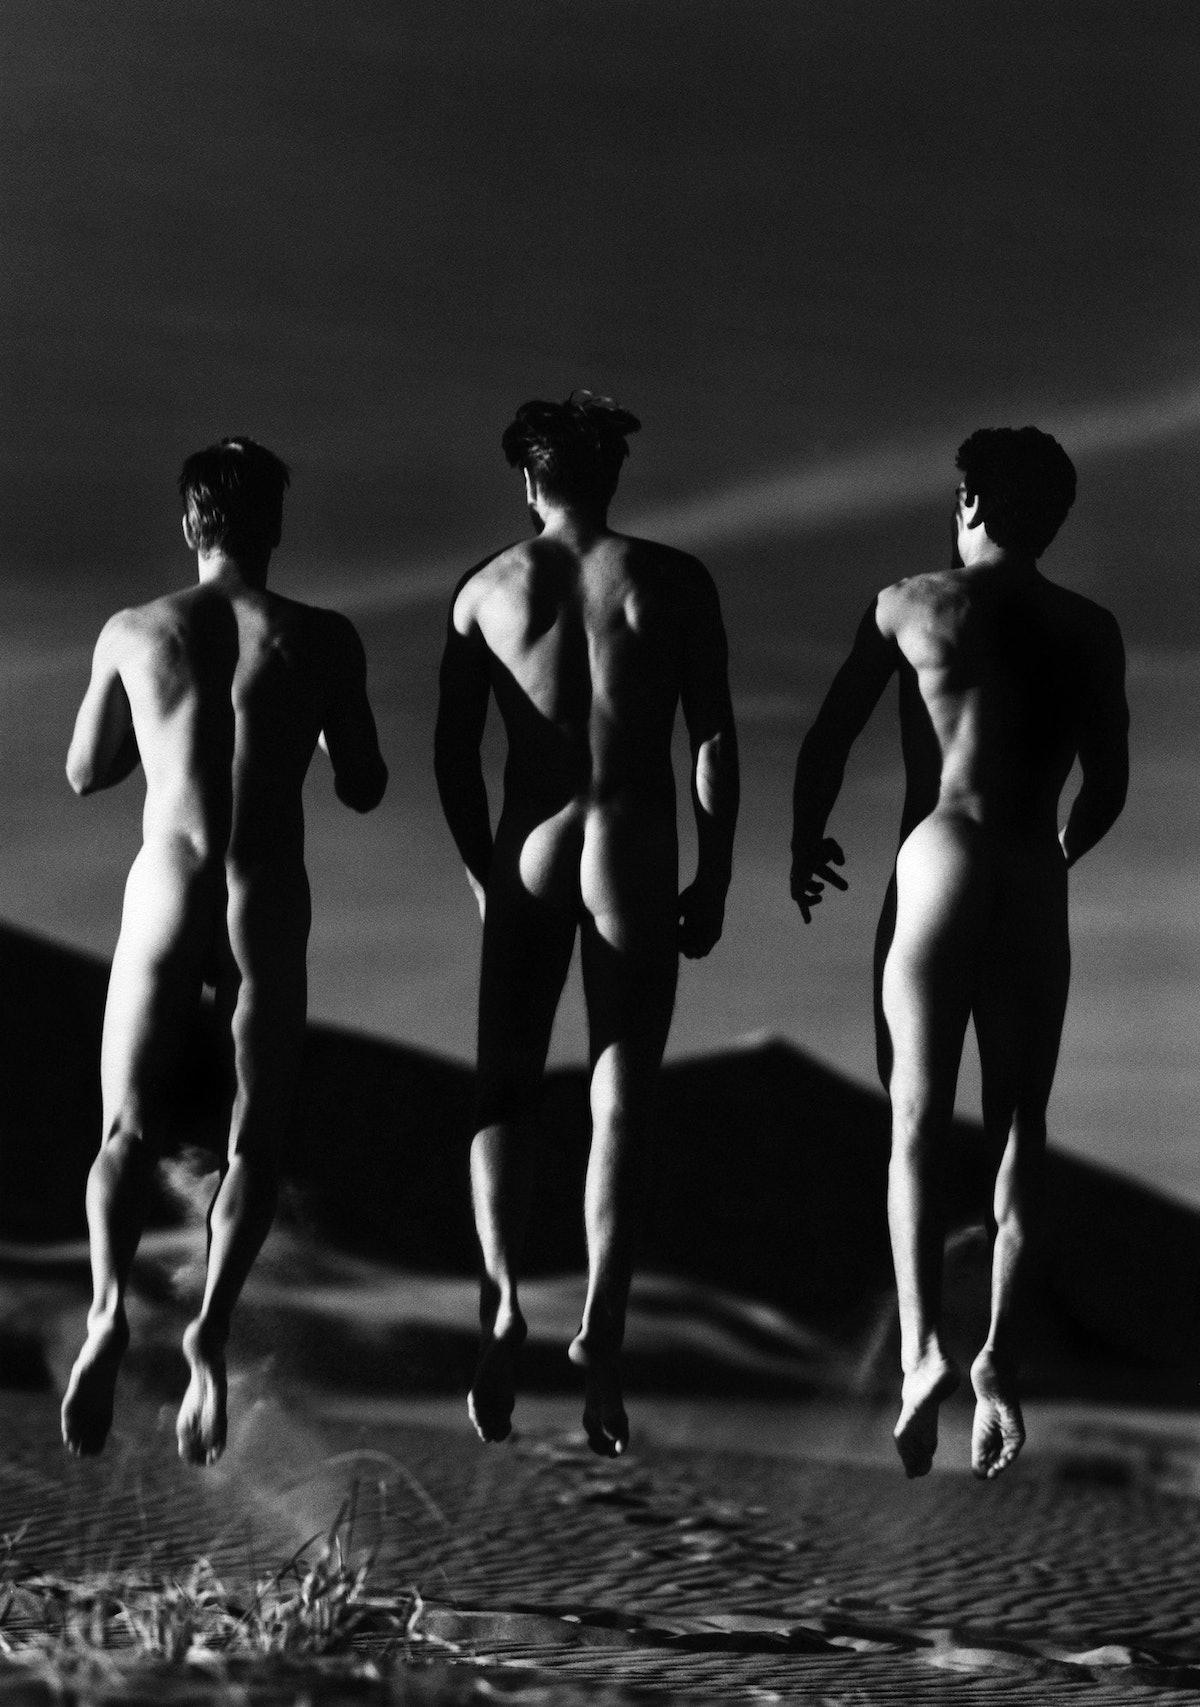 3 Boys Jumping, Kelso Dunes, 1991 © Greg Gorman.jpg